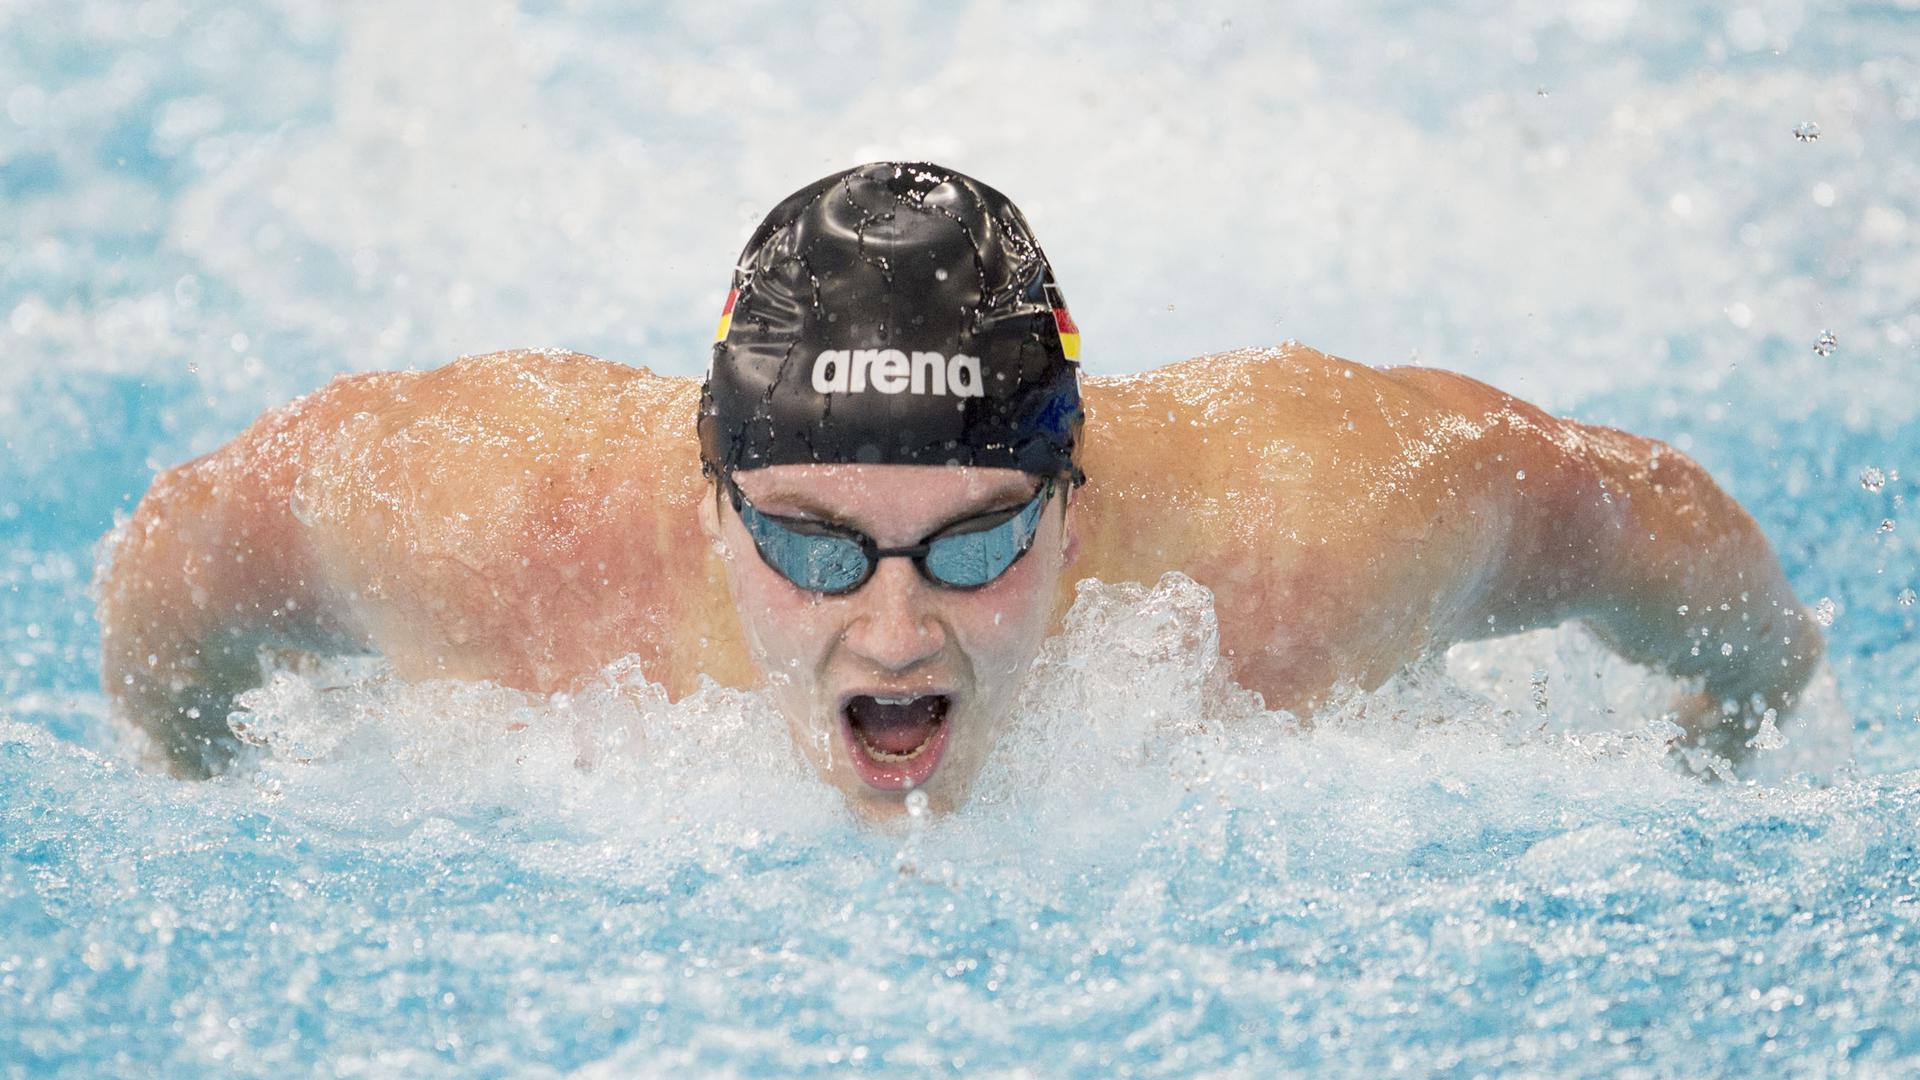 Schwimmen/Kurzbahn: Europameisterschaft im Tollcross International Swimming Centre, 200 m Schmetterling, Männer. Daniel Pinneker aus Deutschland in Aktion. +++ dpa-Bildfunk +++